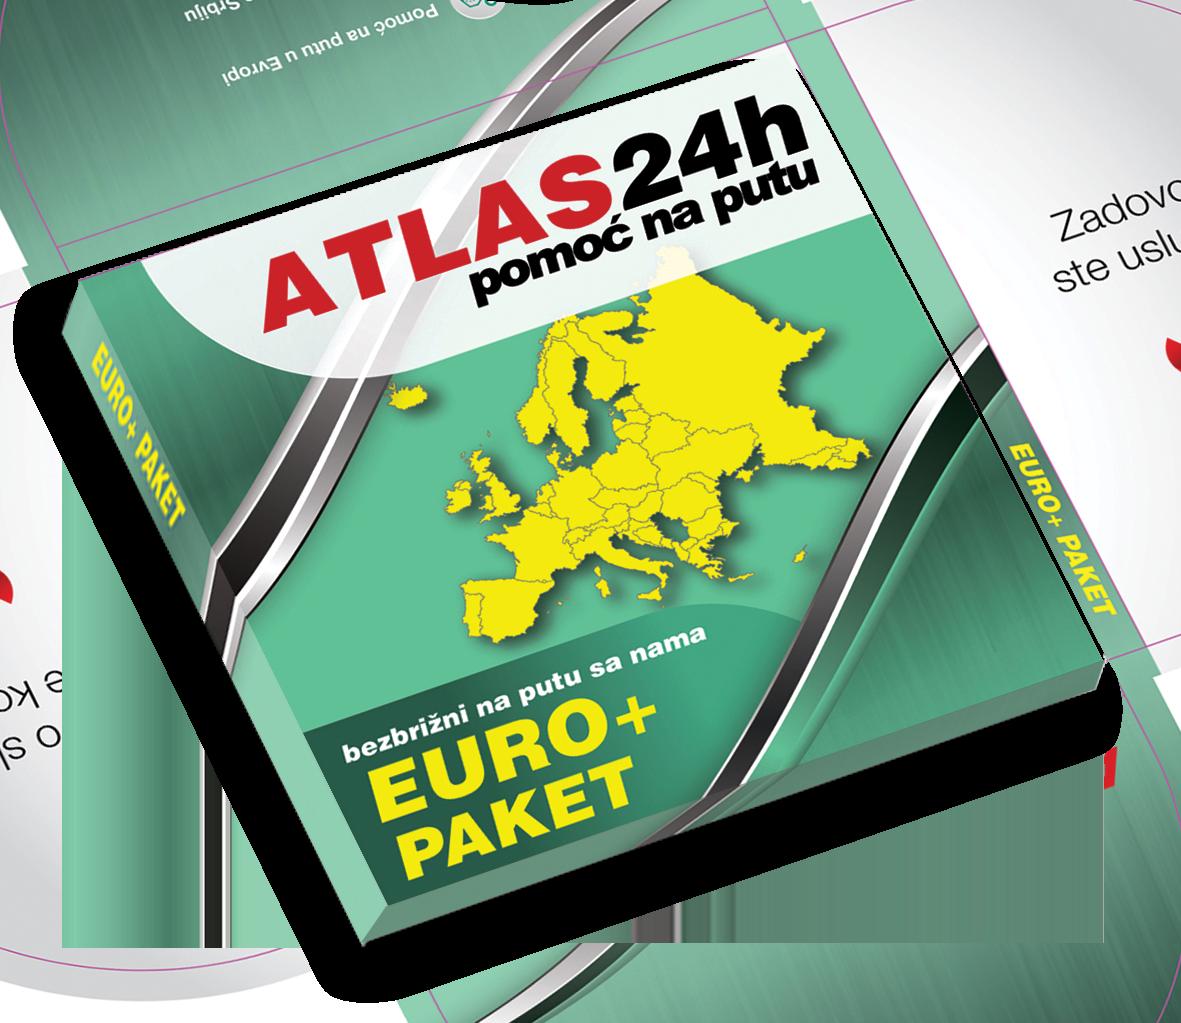 24h Roadside Assistance - Euro+-Paket-3D - pomoć na putu